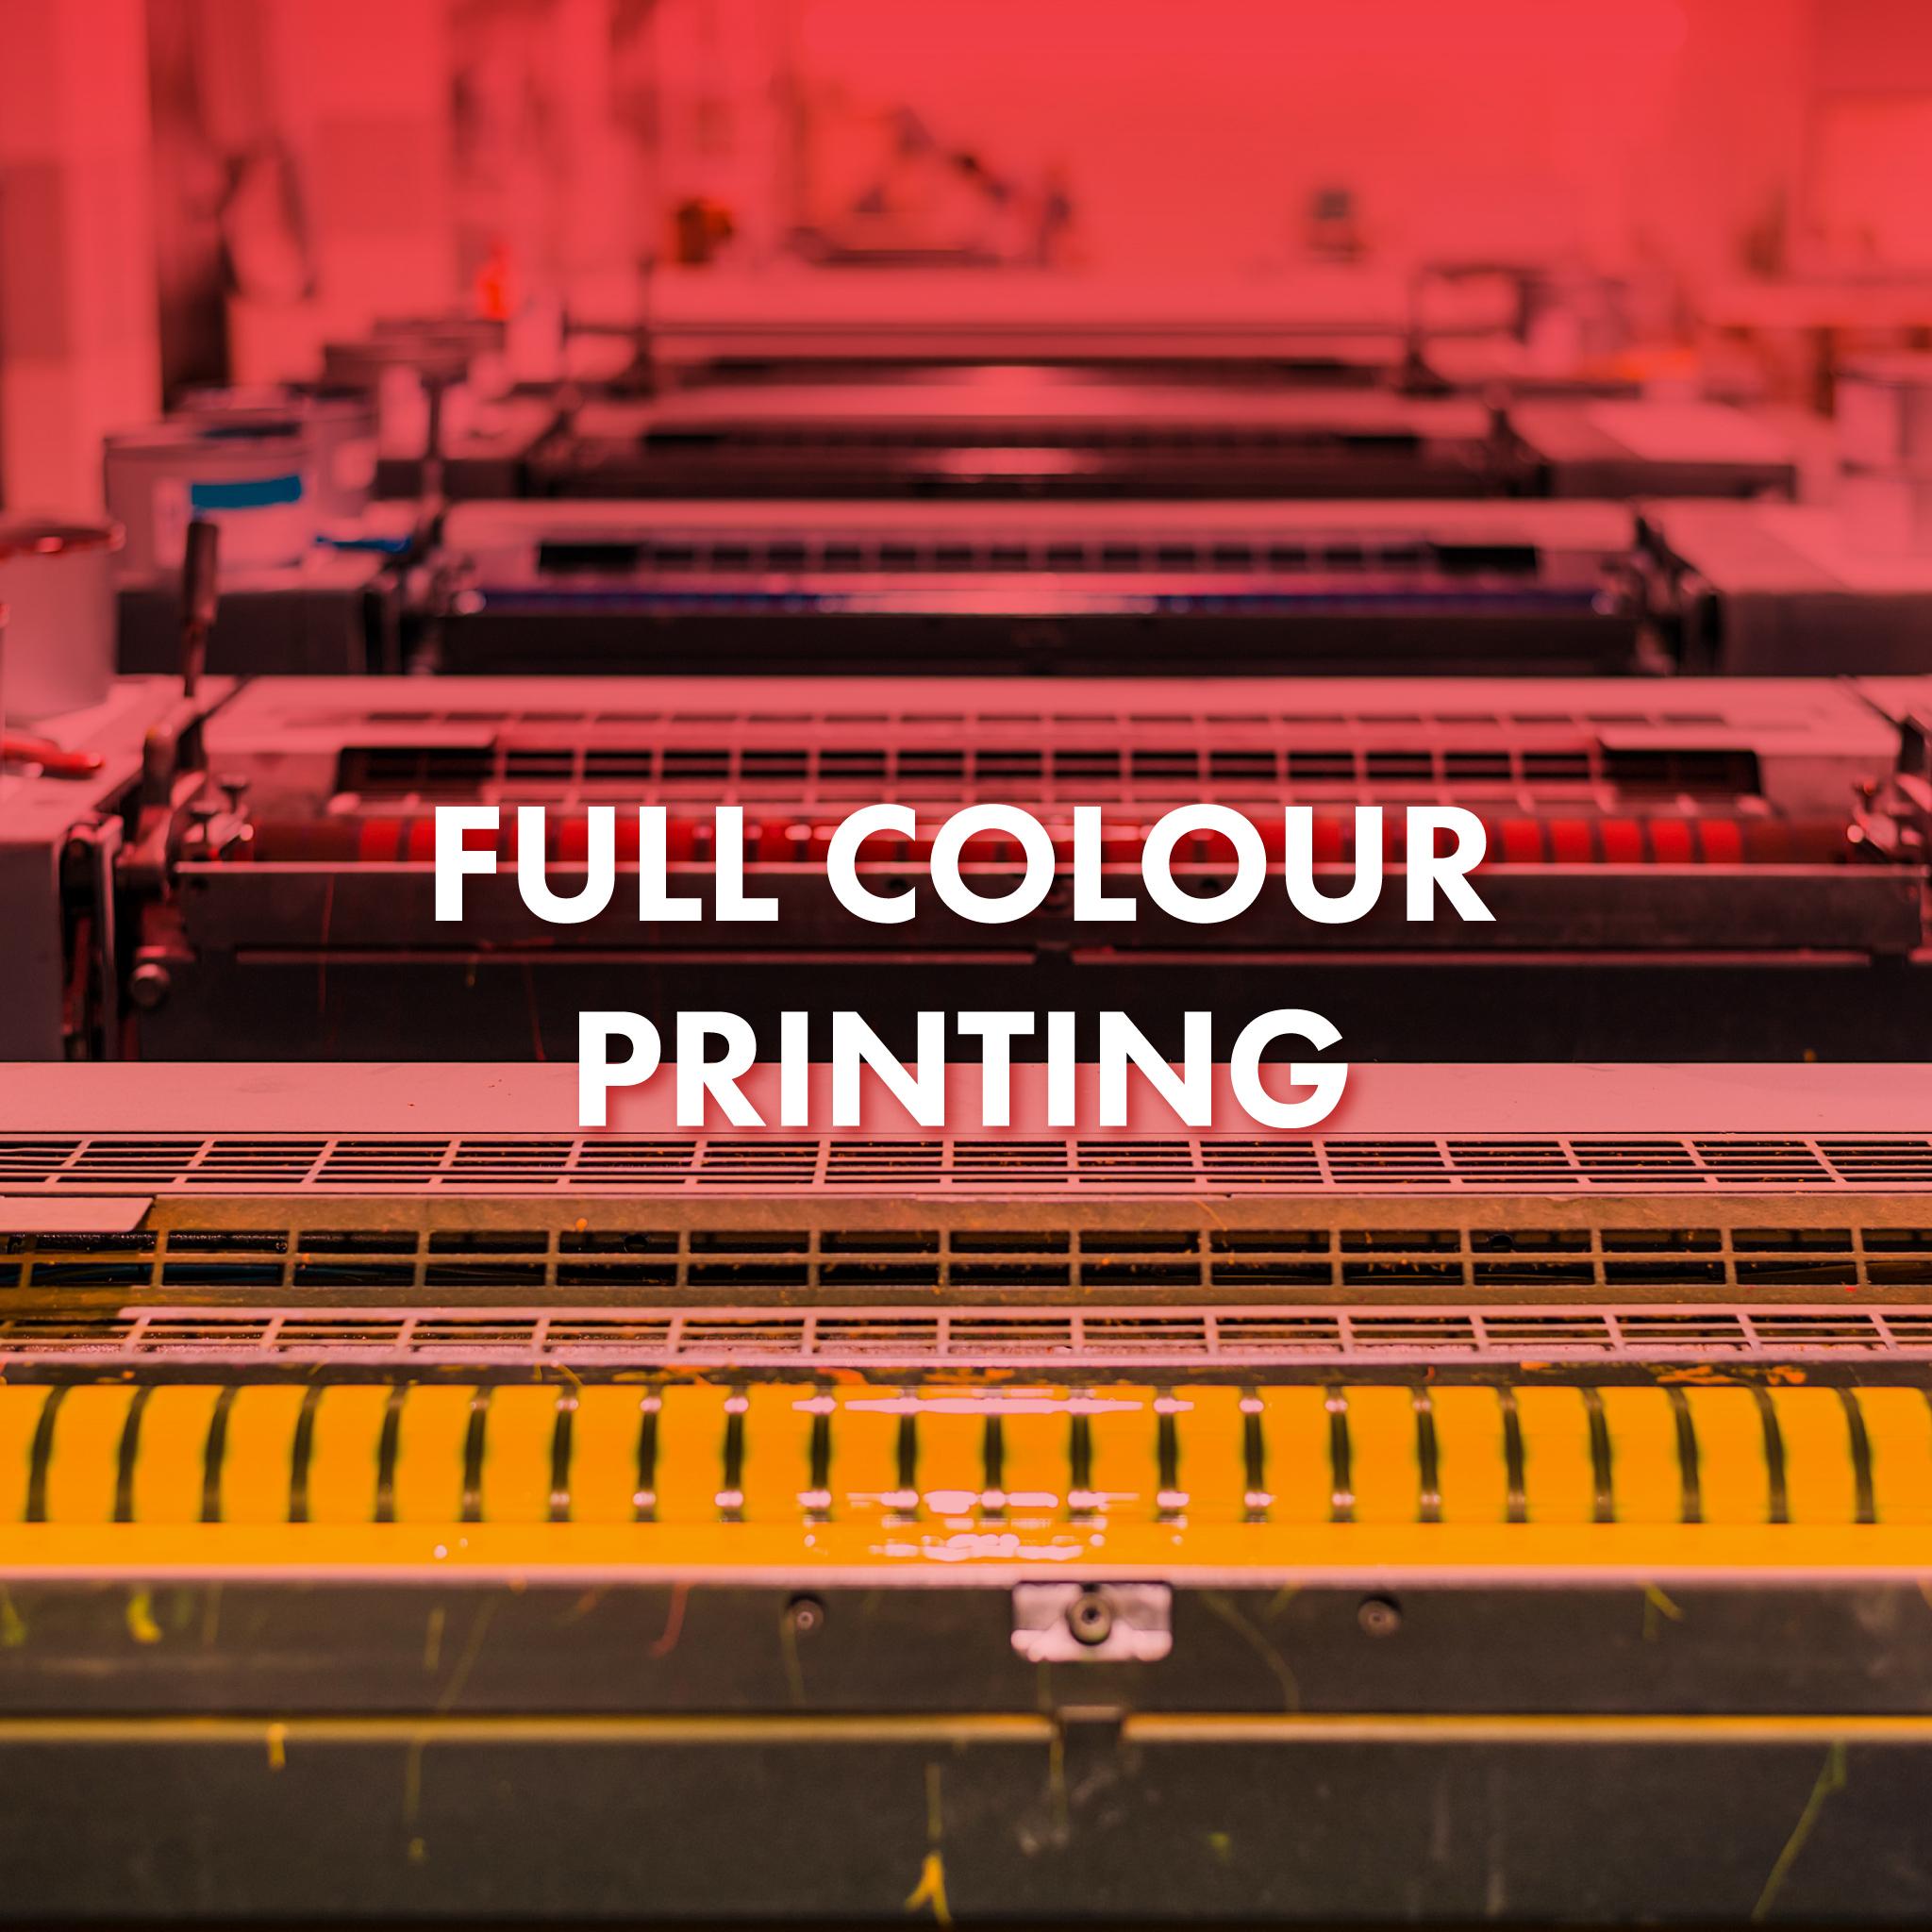 full-colour-printing-image.jpg